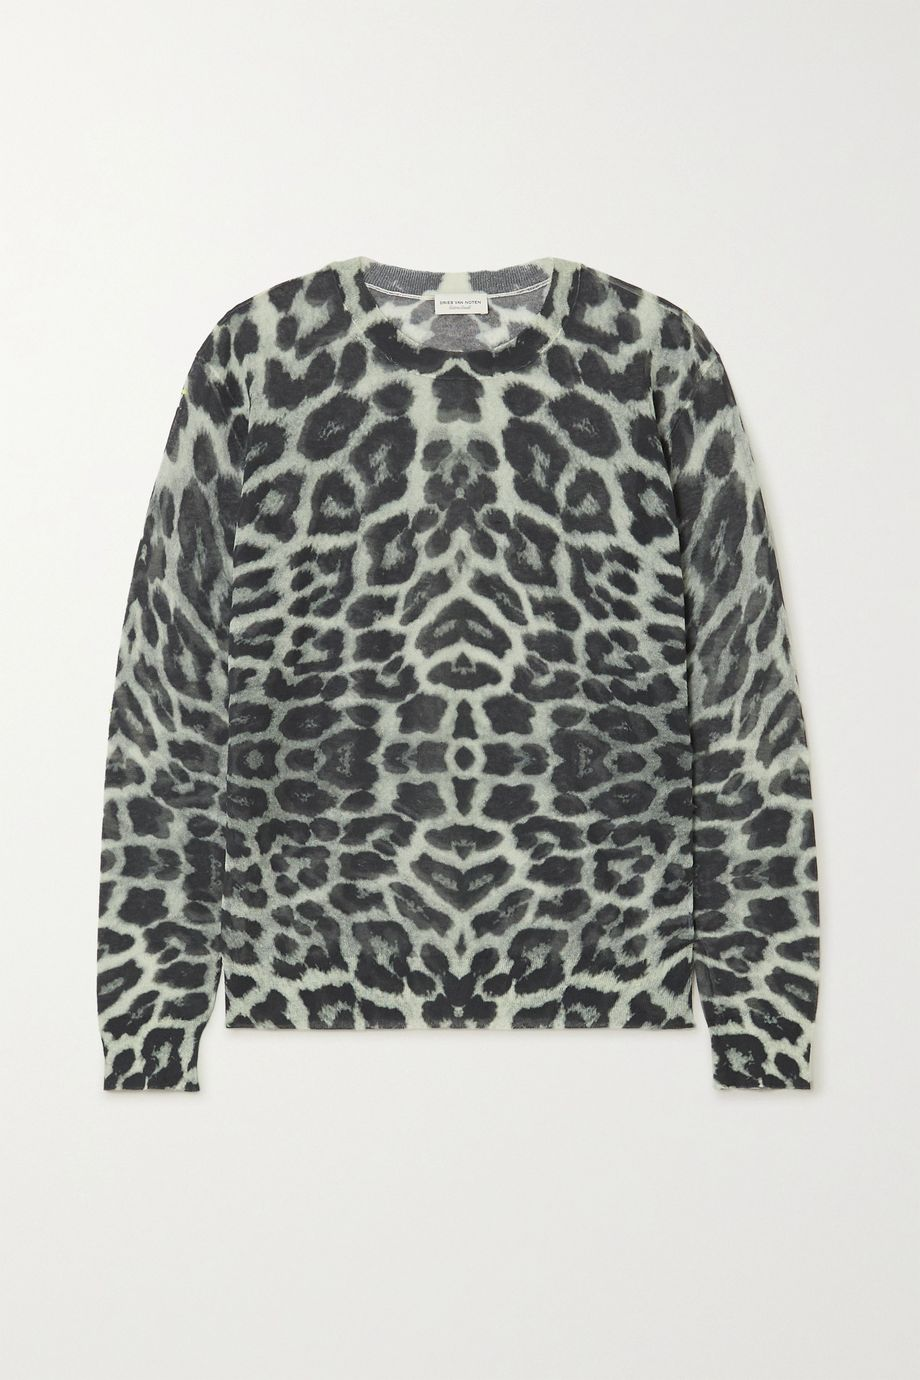 Dries Van Noten Leopard-print cotton-blend sweater